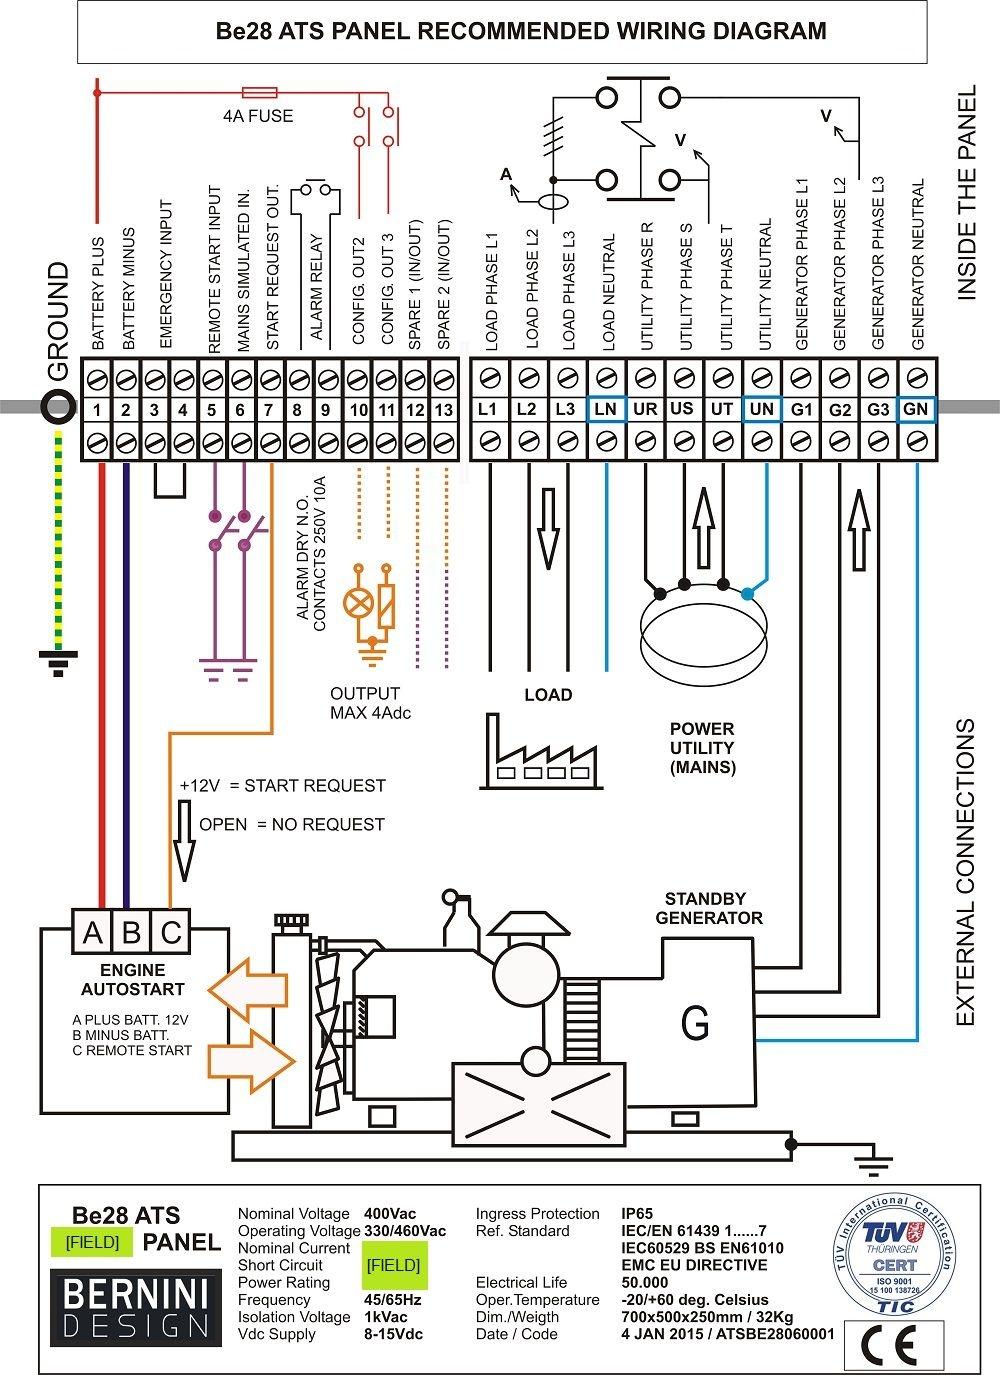 asco transfer switch wiring diagram Download-transfer switch wiring diagram Generac Automatic Transfer Switch Wiring Diagram Throughout Free With 18-h